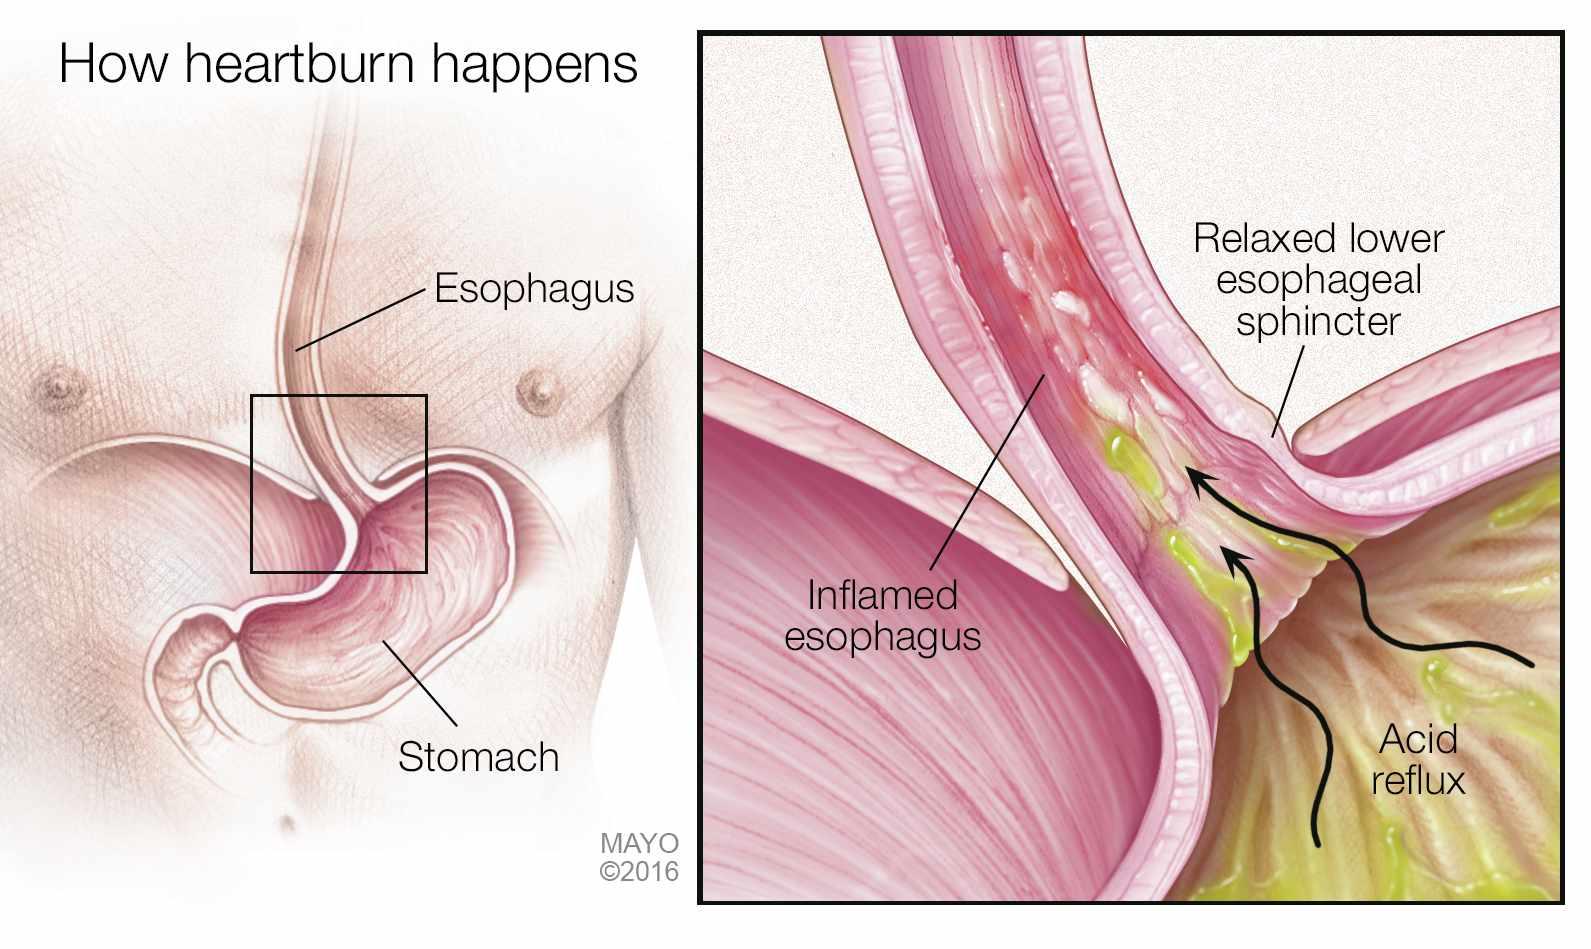 a medical illustration of how heartburn, acid reflux happens